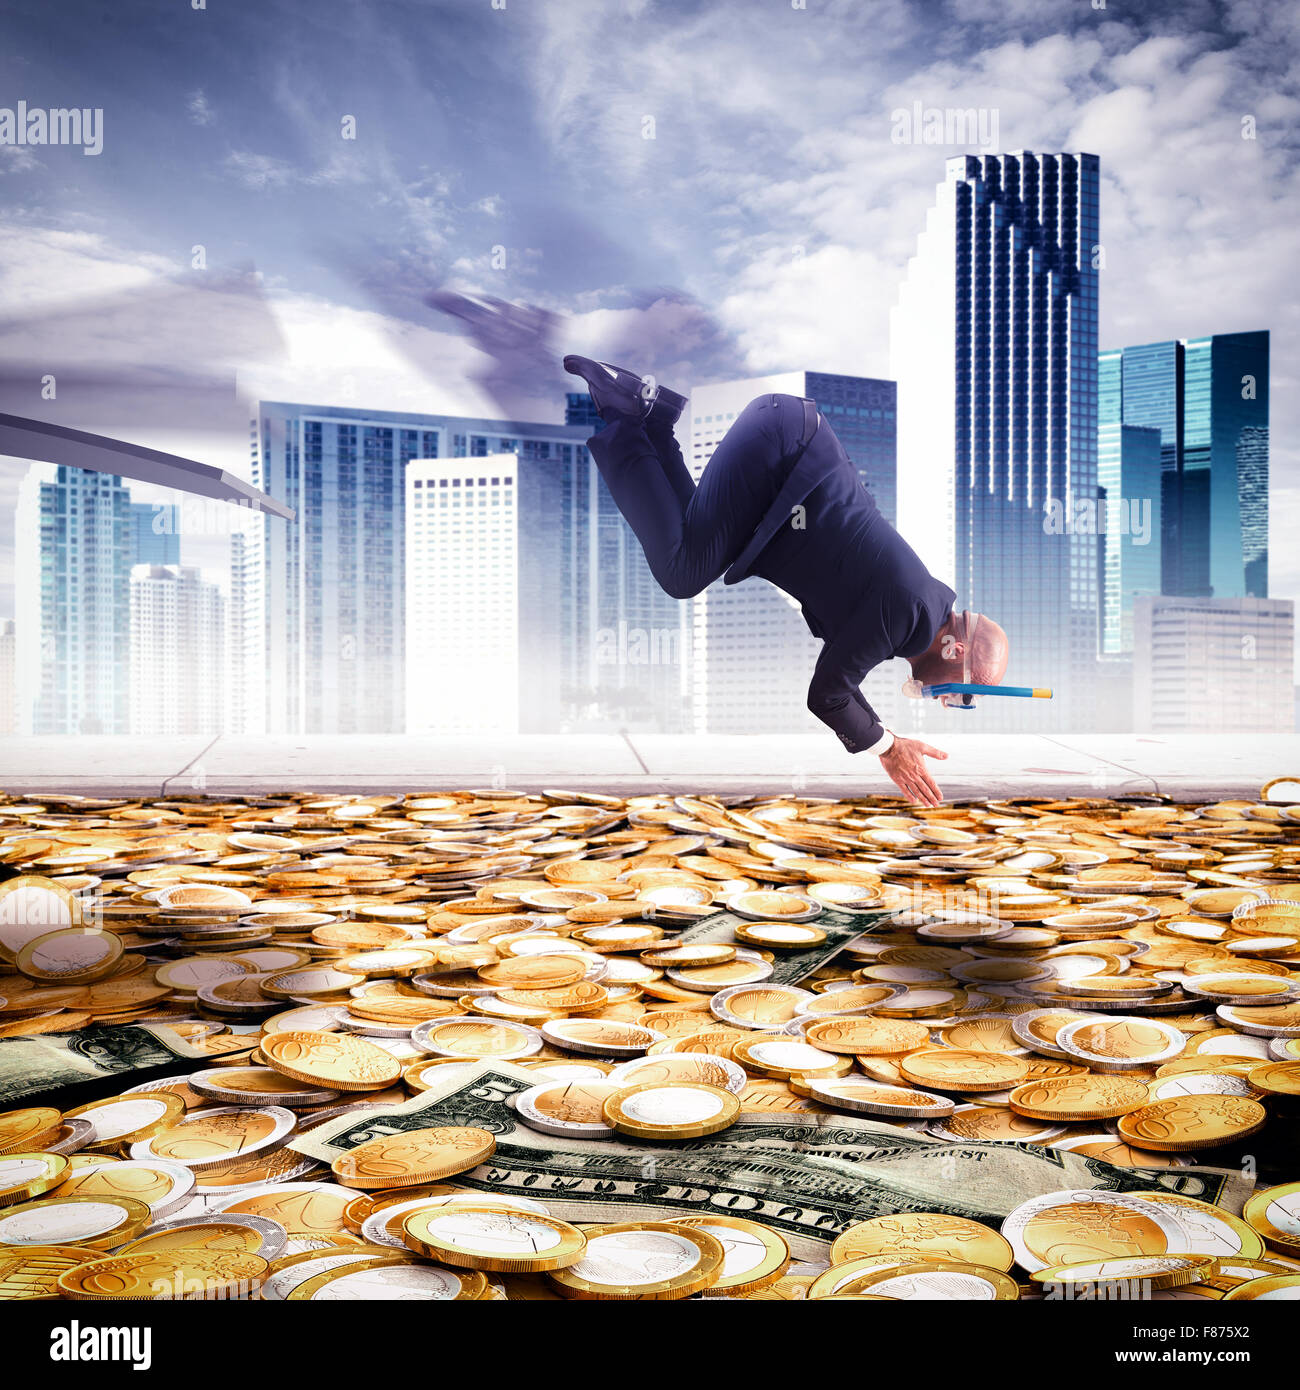 Sumérjase en la riqueza Imagen De Stock